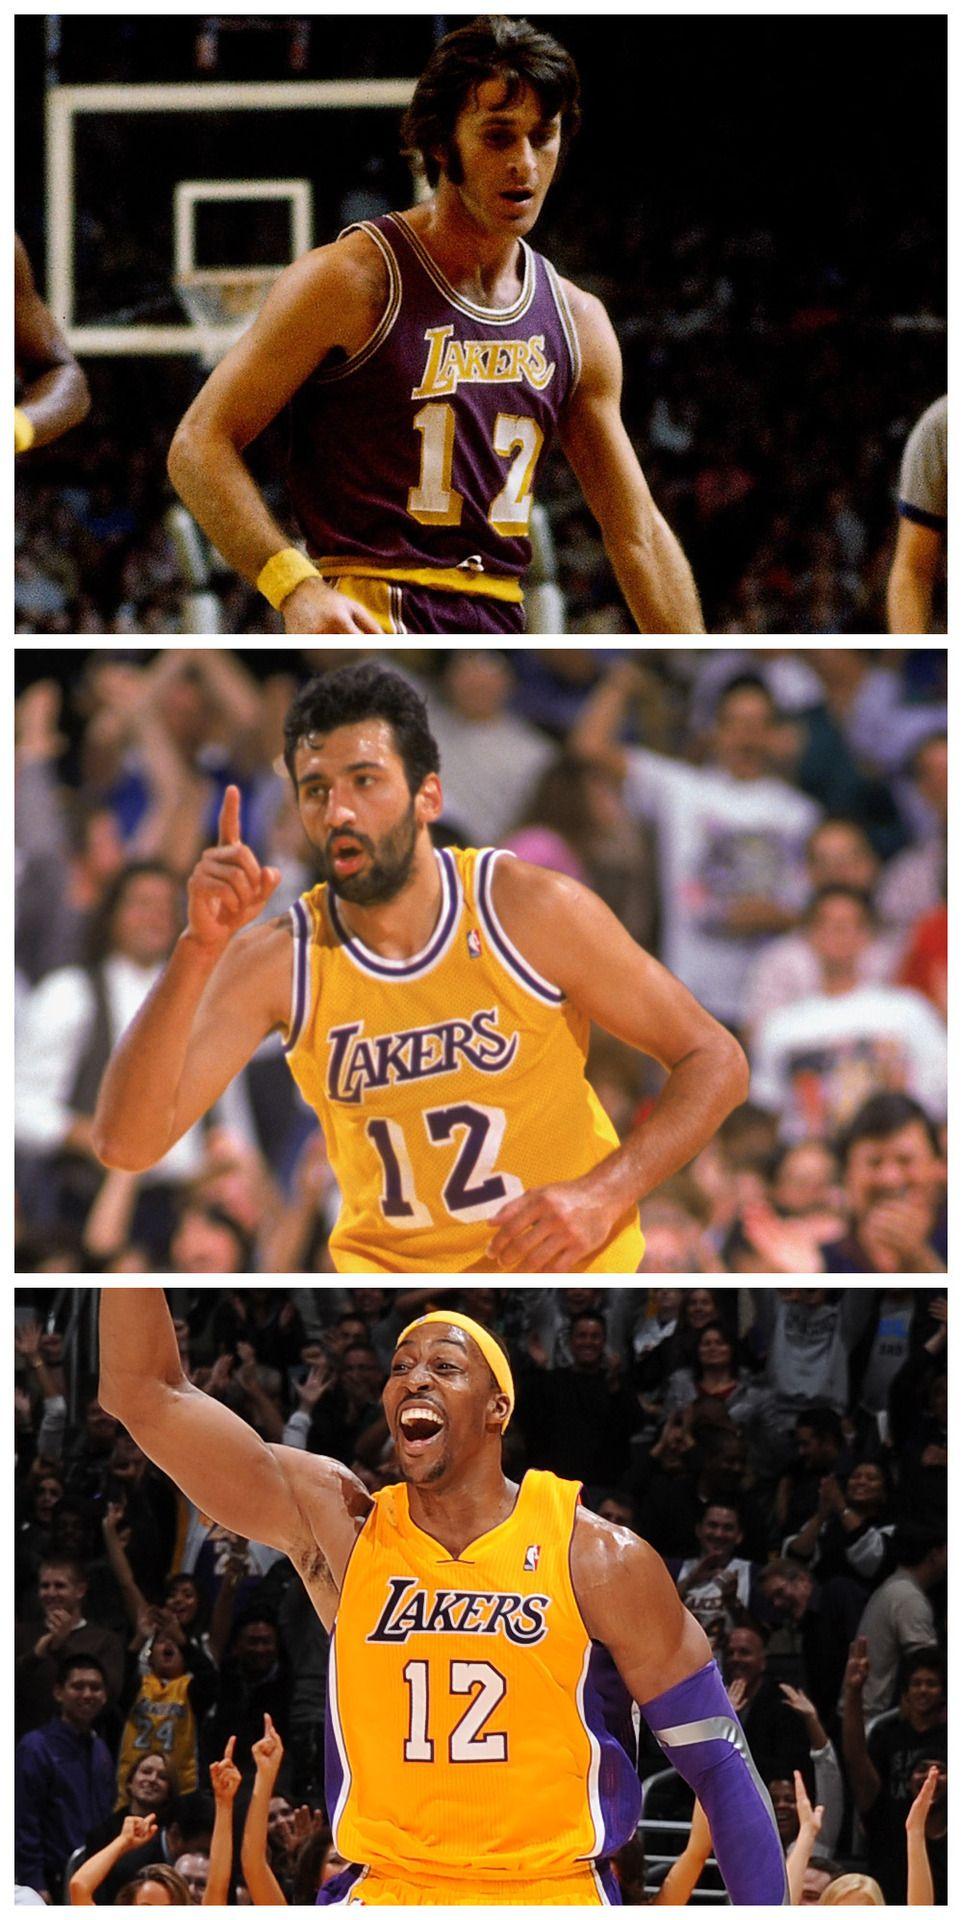 Los Angeles Lakers 12 Pat Riley Vlade Divac Dwight Howard Los Angeles Lakers Lakers La Lakers